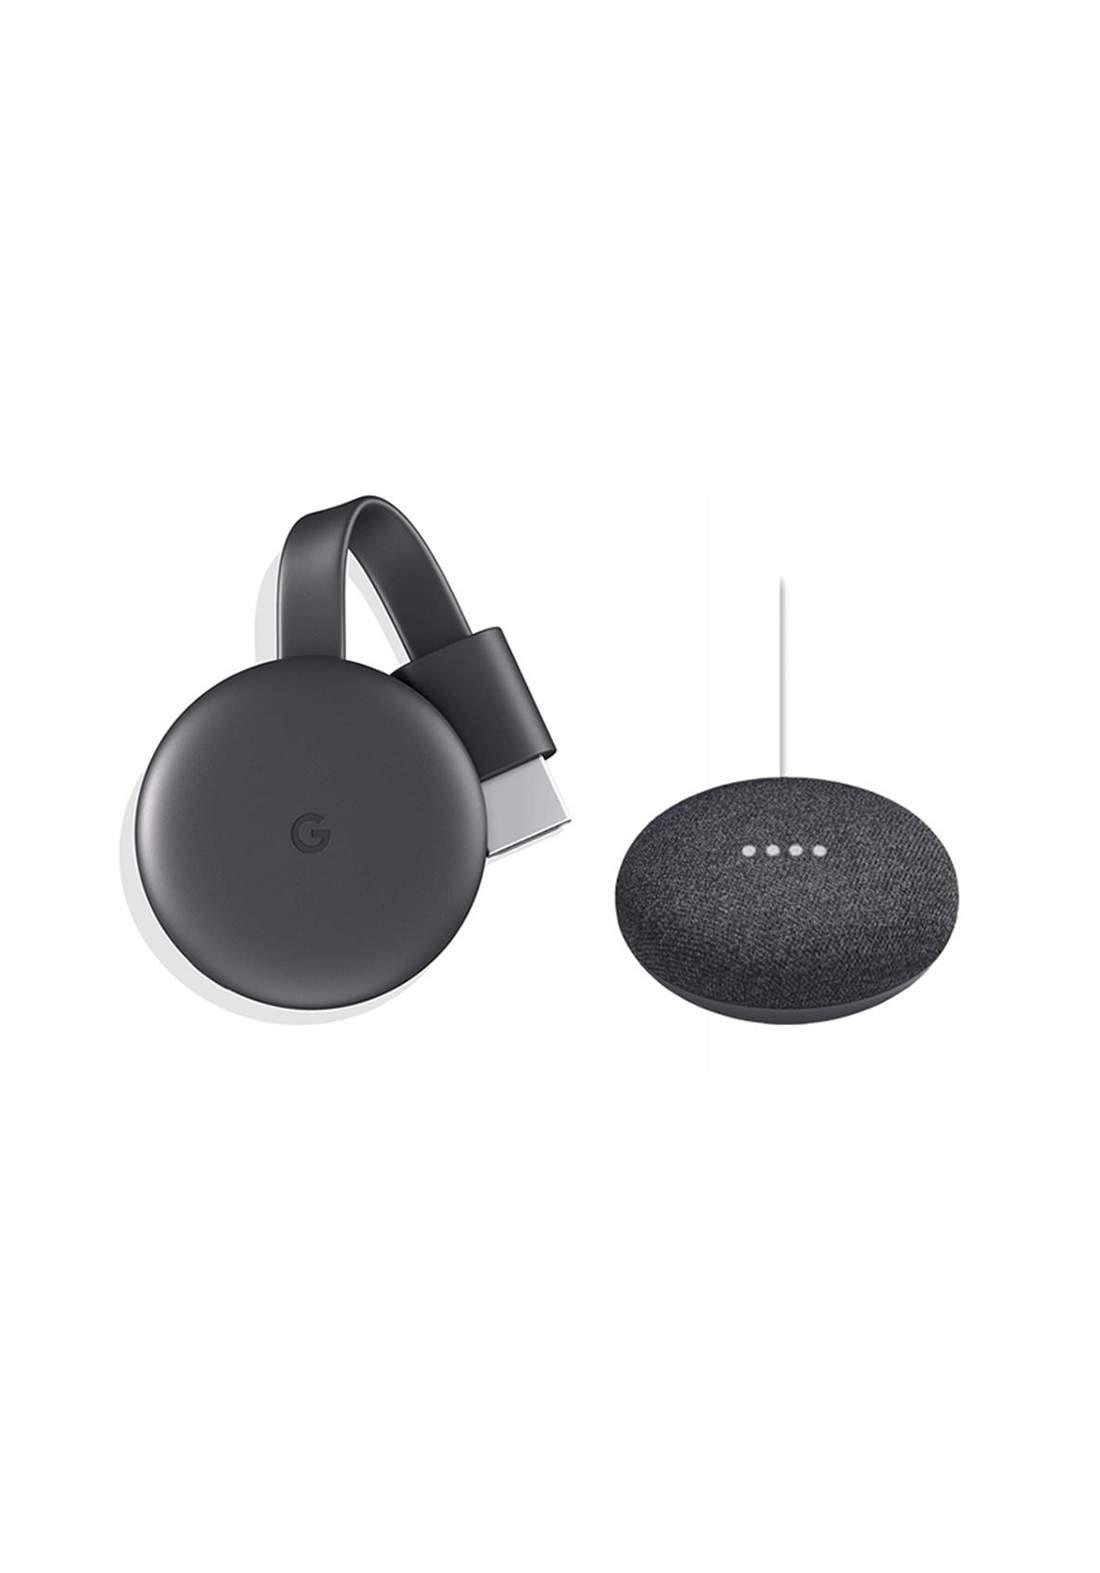 محول عرض لاسلكي Google Smart TV Kit